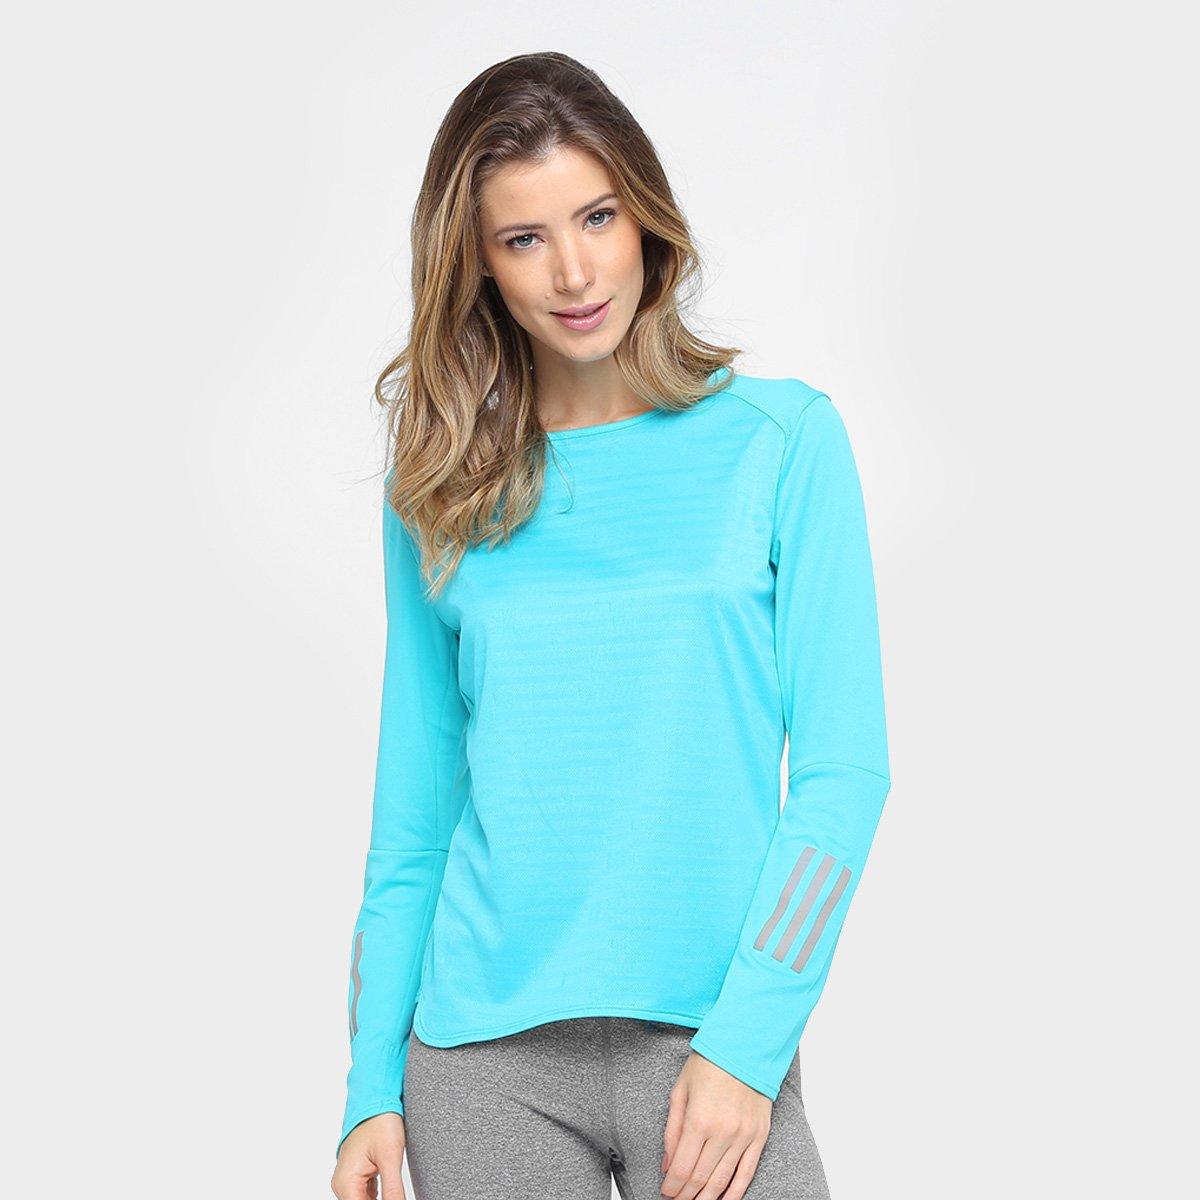 f9e5f7a0a1e1a Camiseta Adidas Response Manga Longa Feminina - Compre Agora